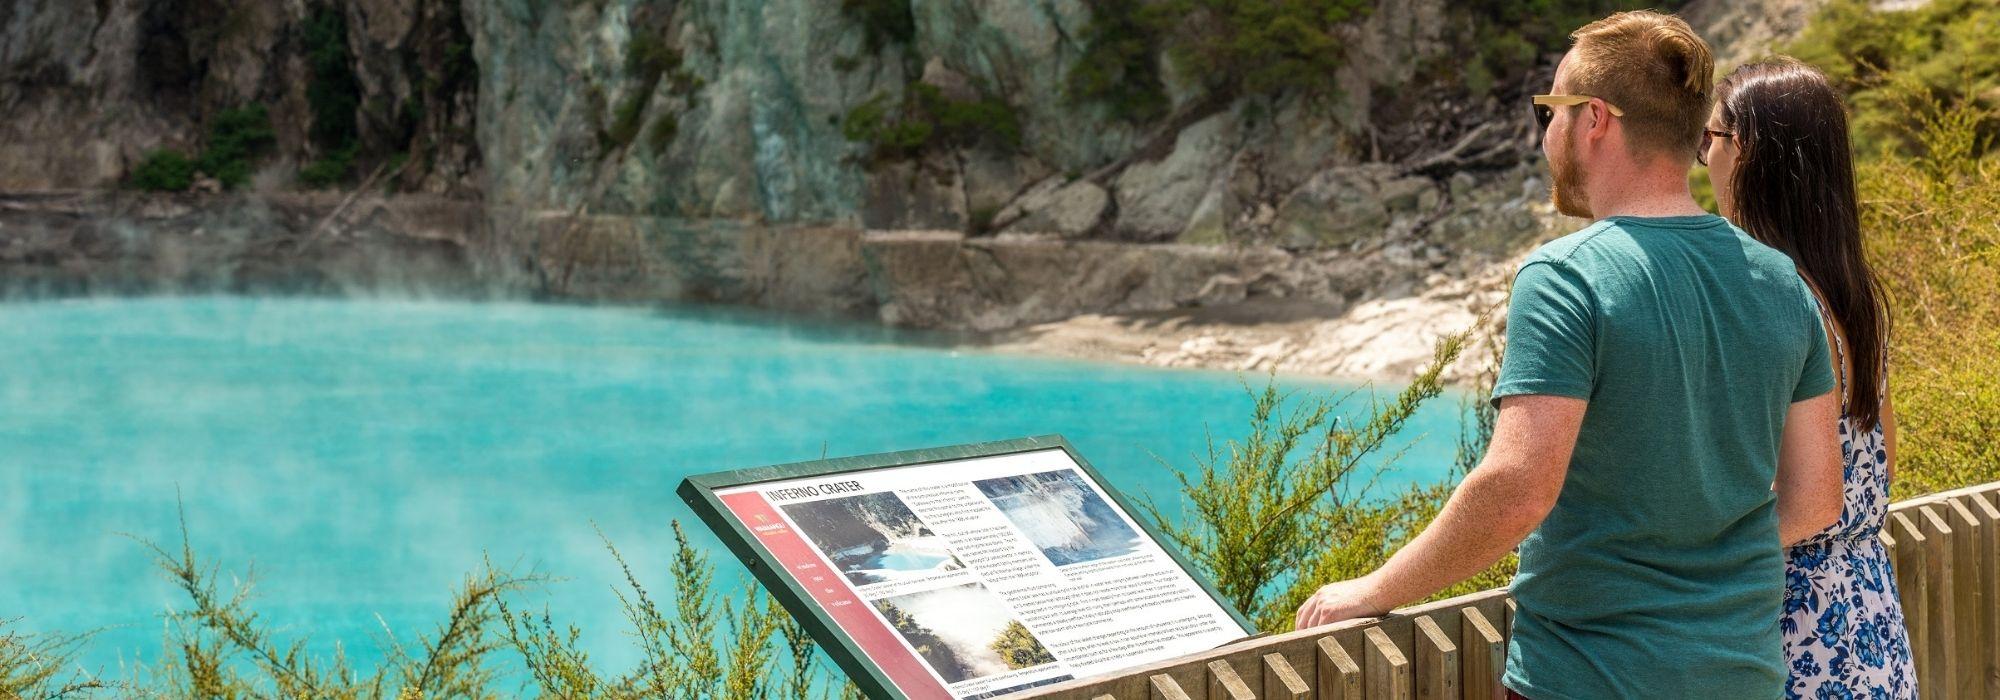 Big fun, tiny footprint: How to have an eco-holiday in Rotorua